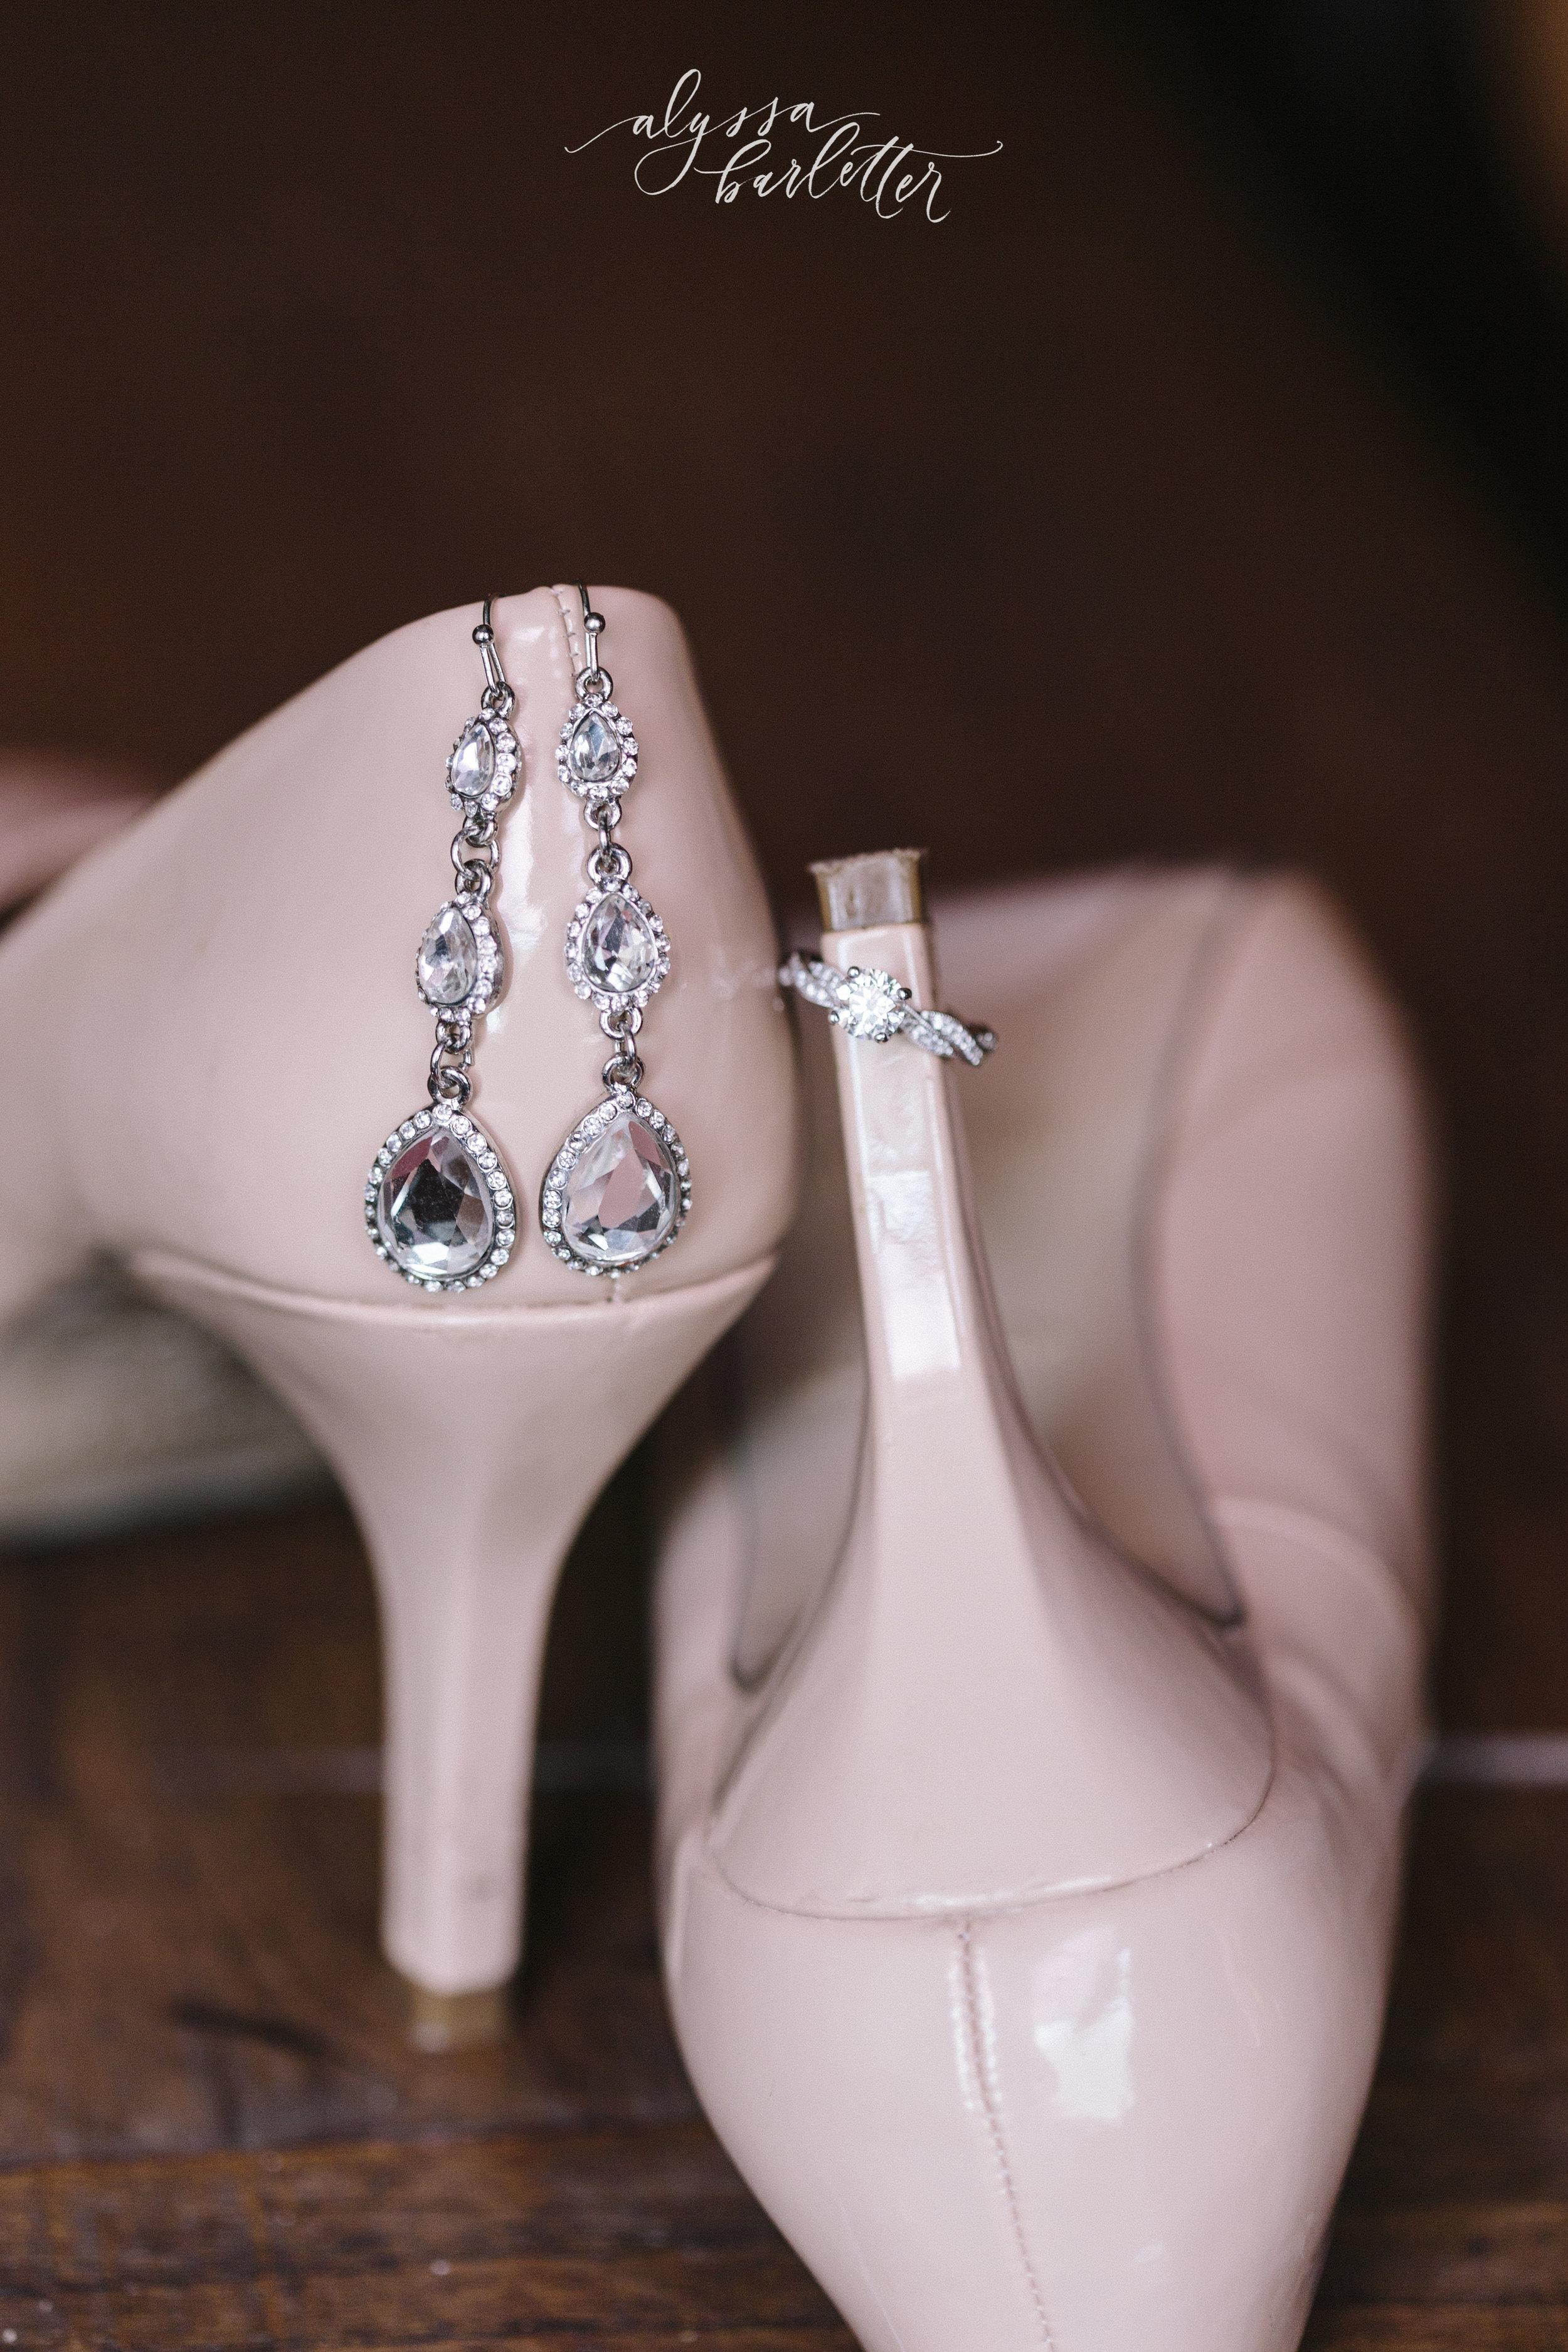 shoes-8959.jpg